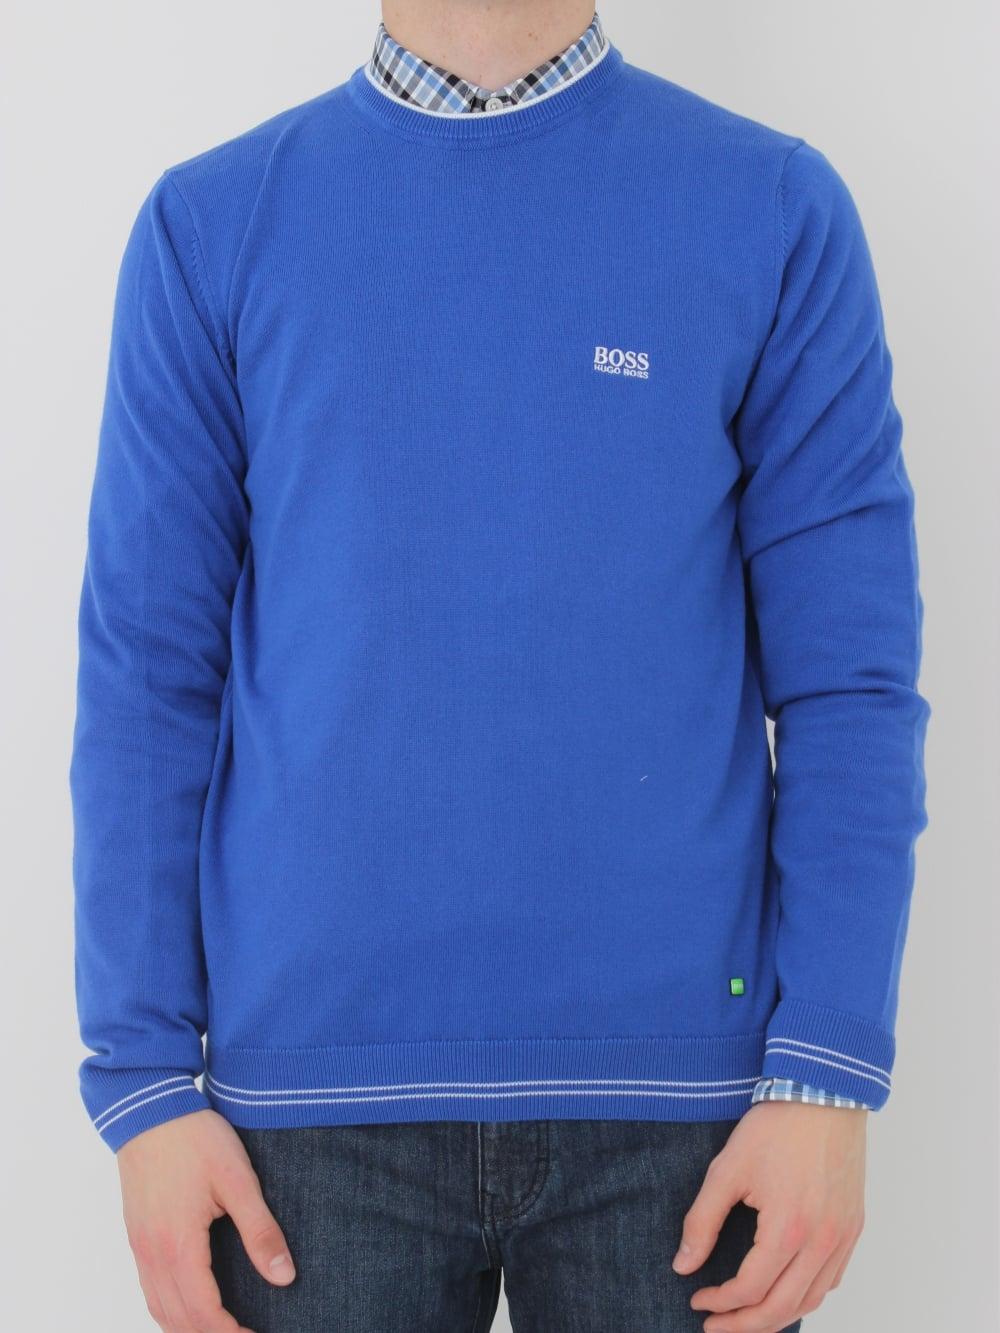 36313628 HUGO BOSS BOSS Green Rime Crew Neck Knit in Medium Blue - Northern ...